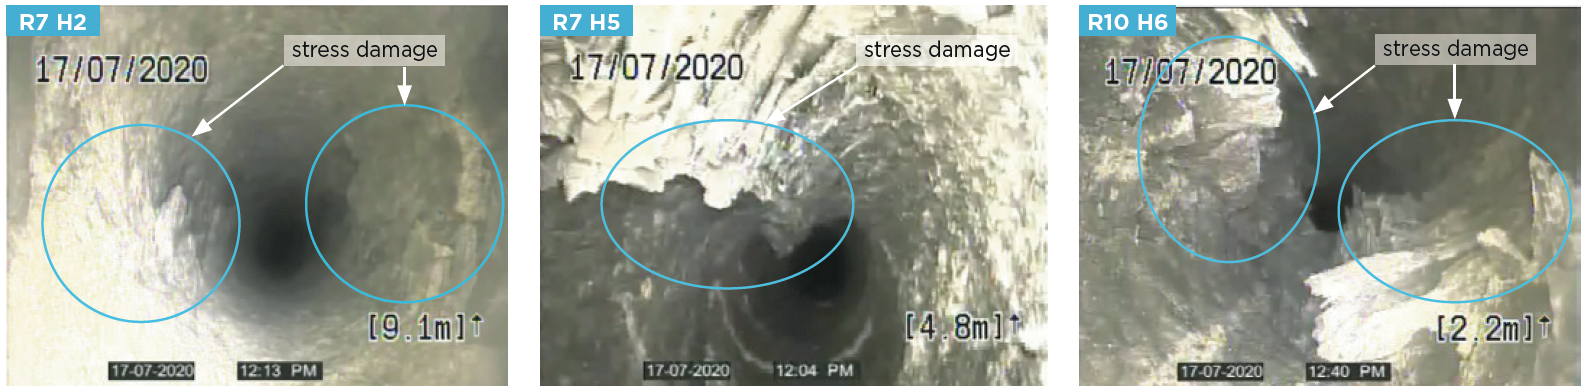 me-safe-stress-damage